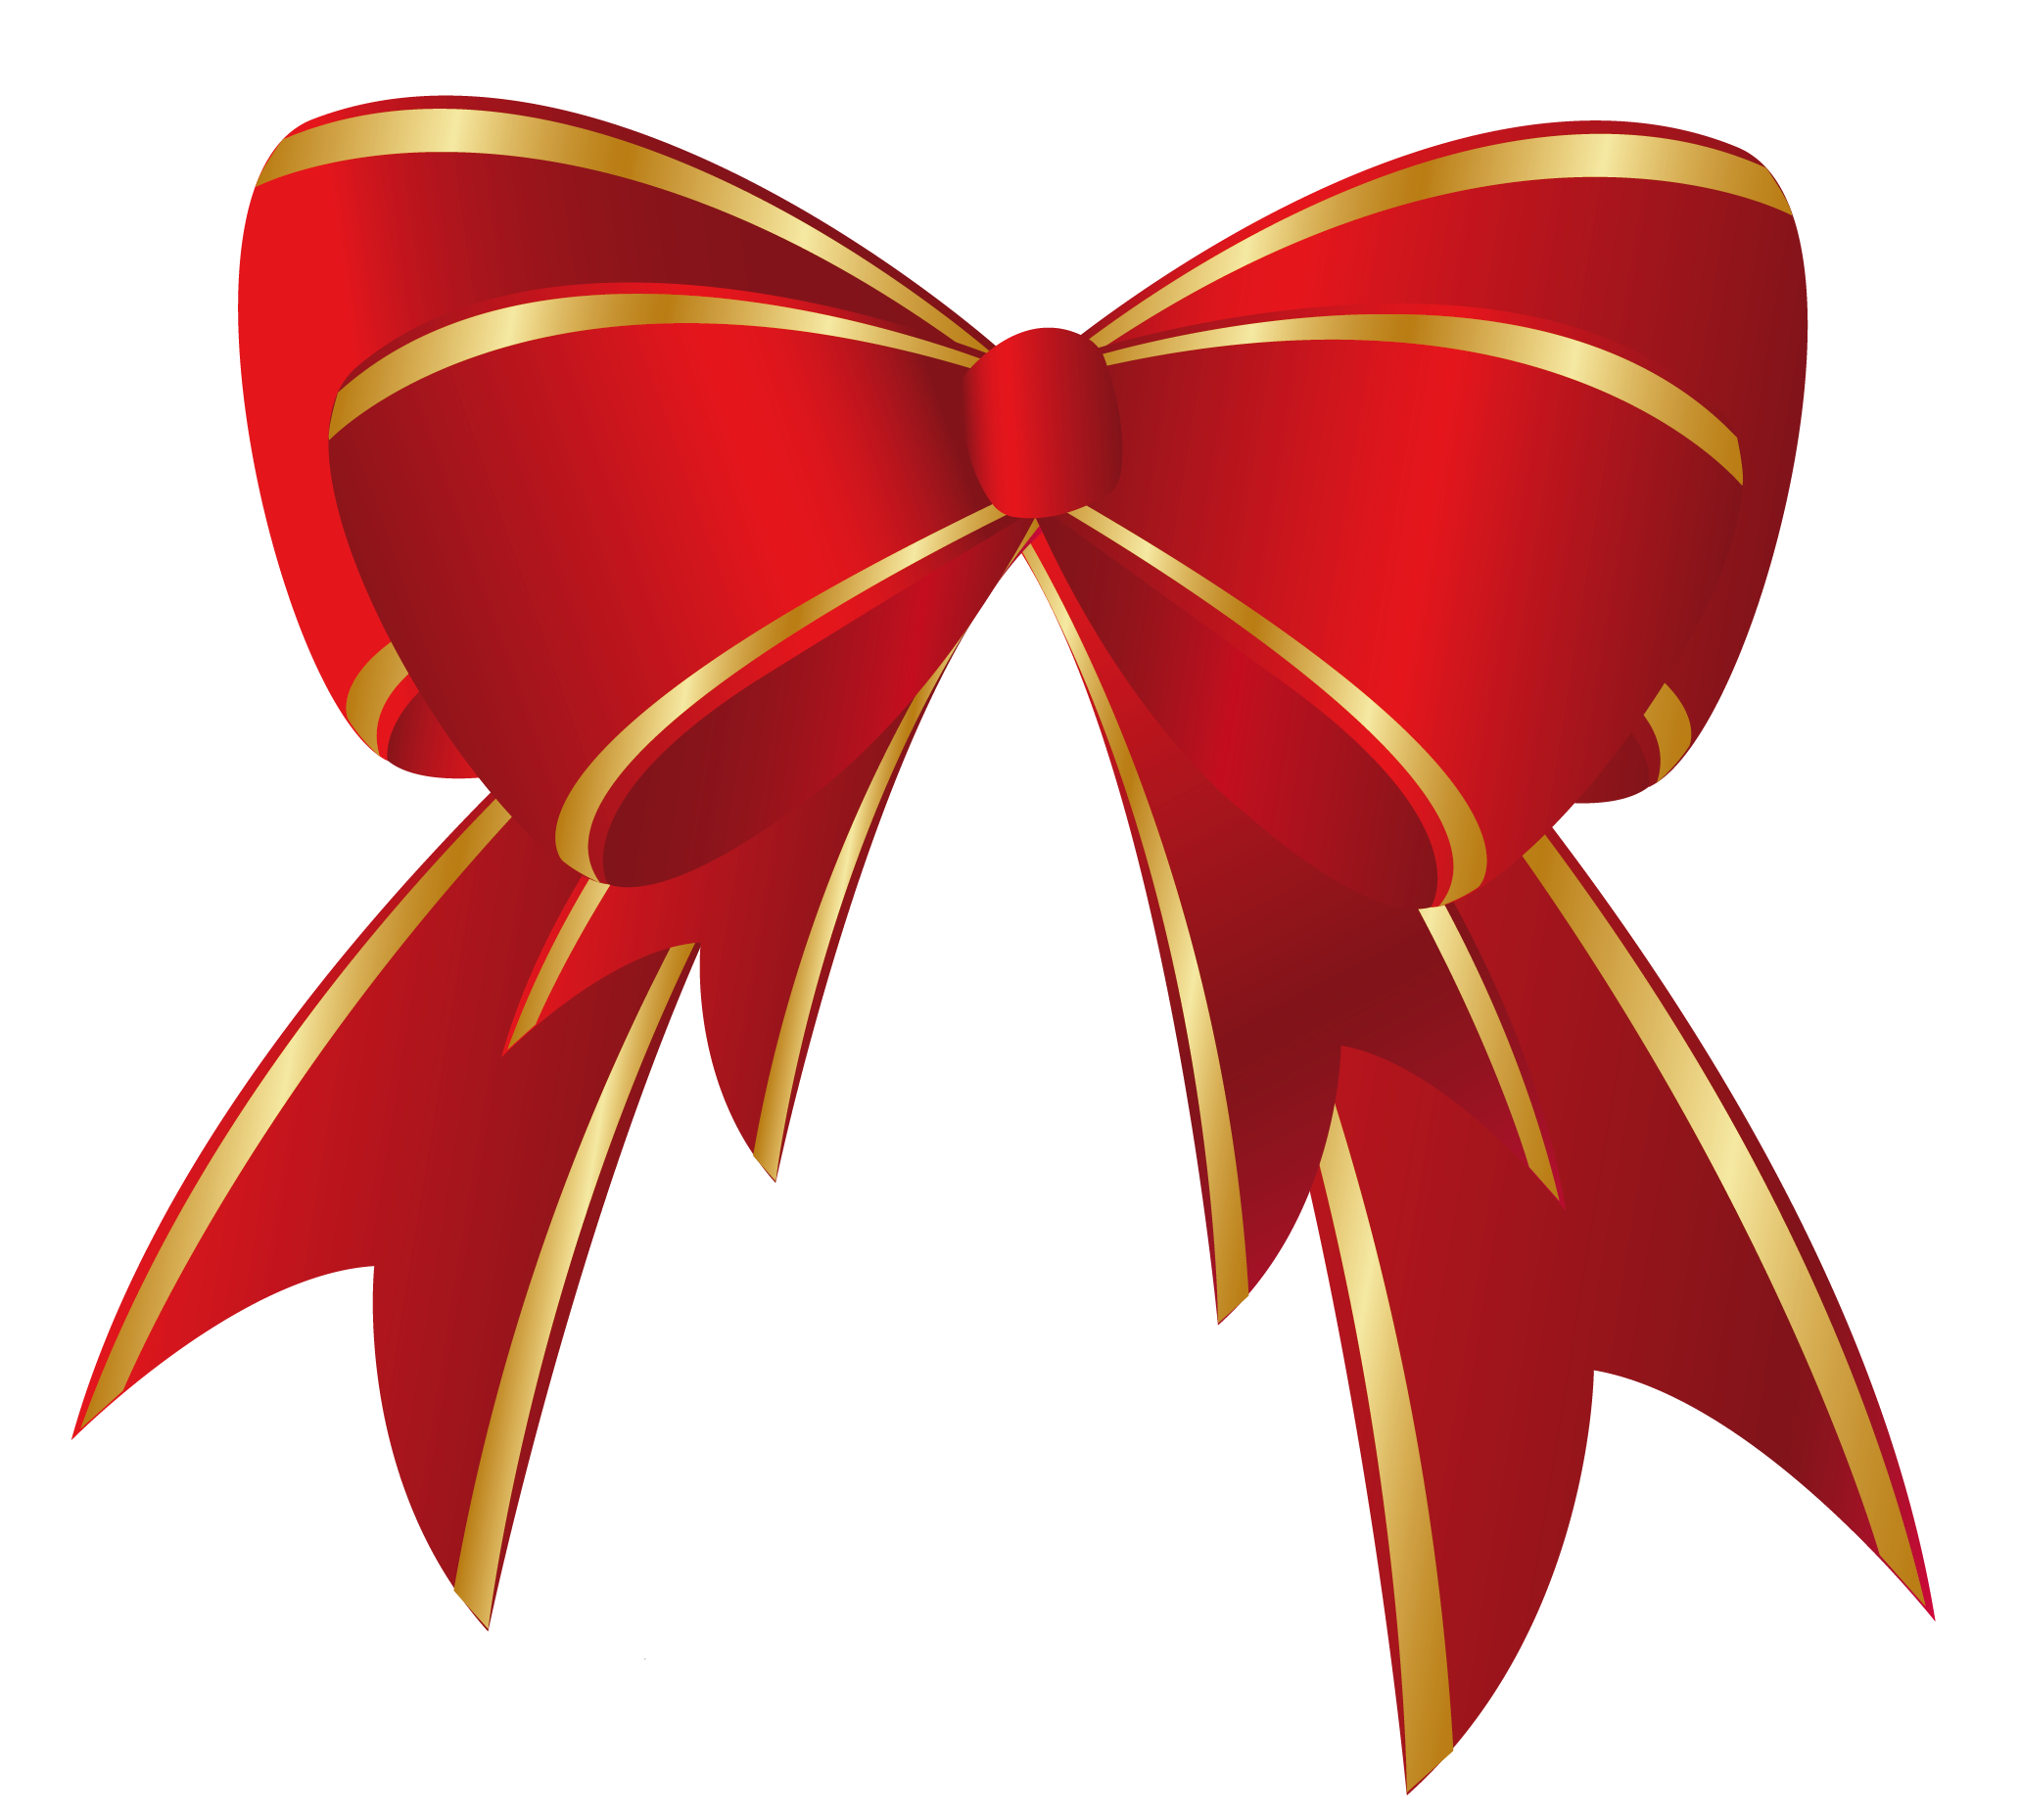 Bow Clip Art Free Cliparts Co-Bow Clip Art Free Cliparts Co-2